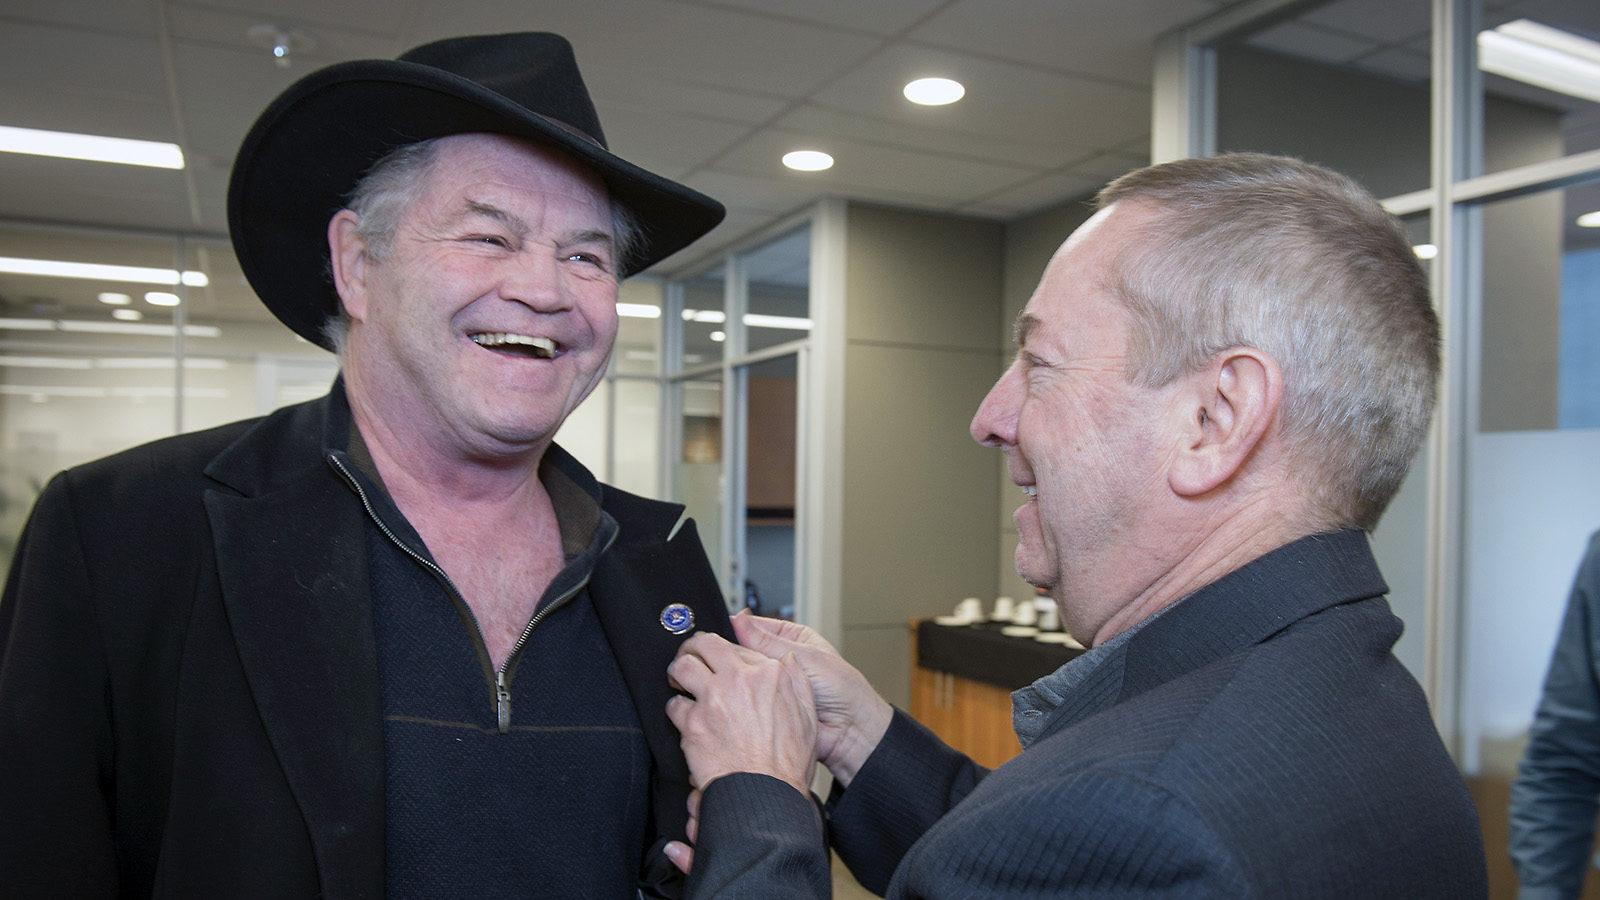 Fermilab Director Nigel Lockyer gives a smiling Micky Dolenz a Fermilab pin